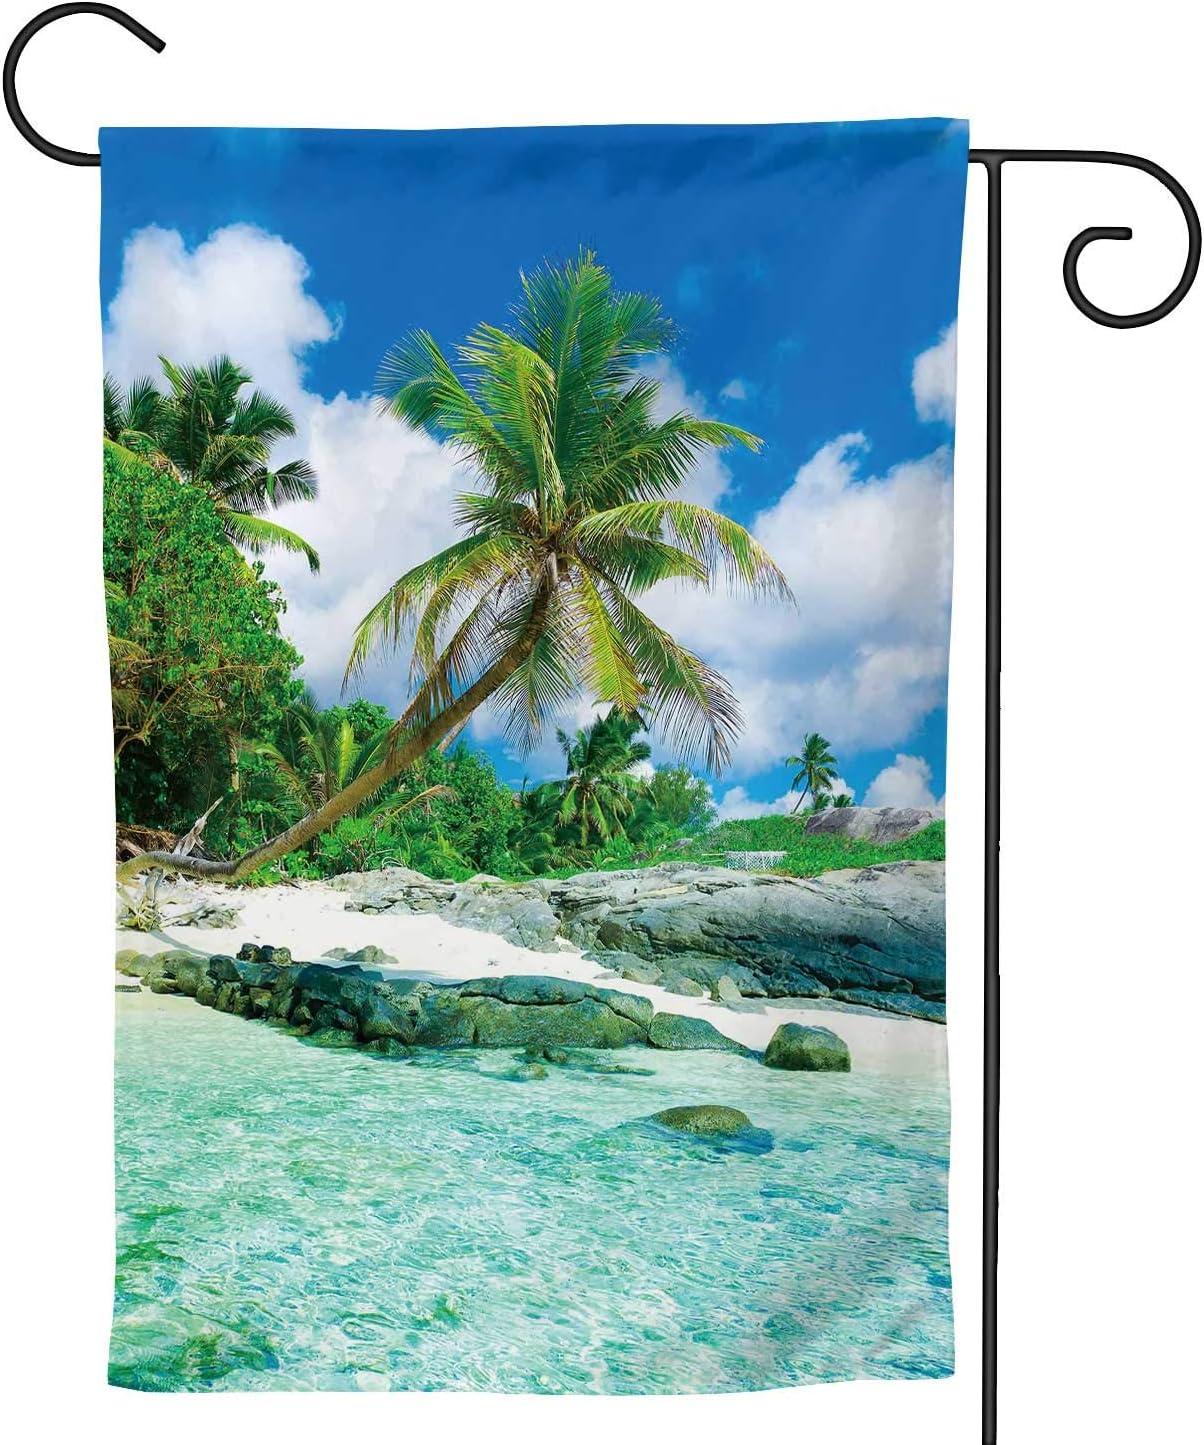 Hitecera Palms Eden Sea,Decorative Outdoor Flag Sign,House Yard Garden Flag Seasonal Outside Decoration 12.5''x18''